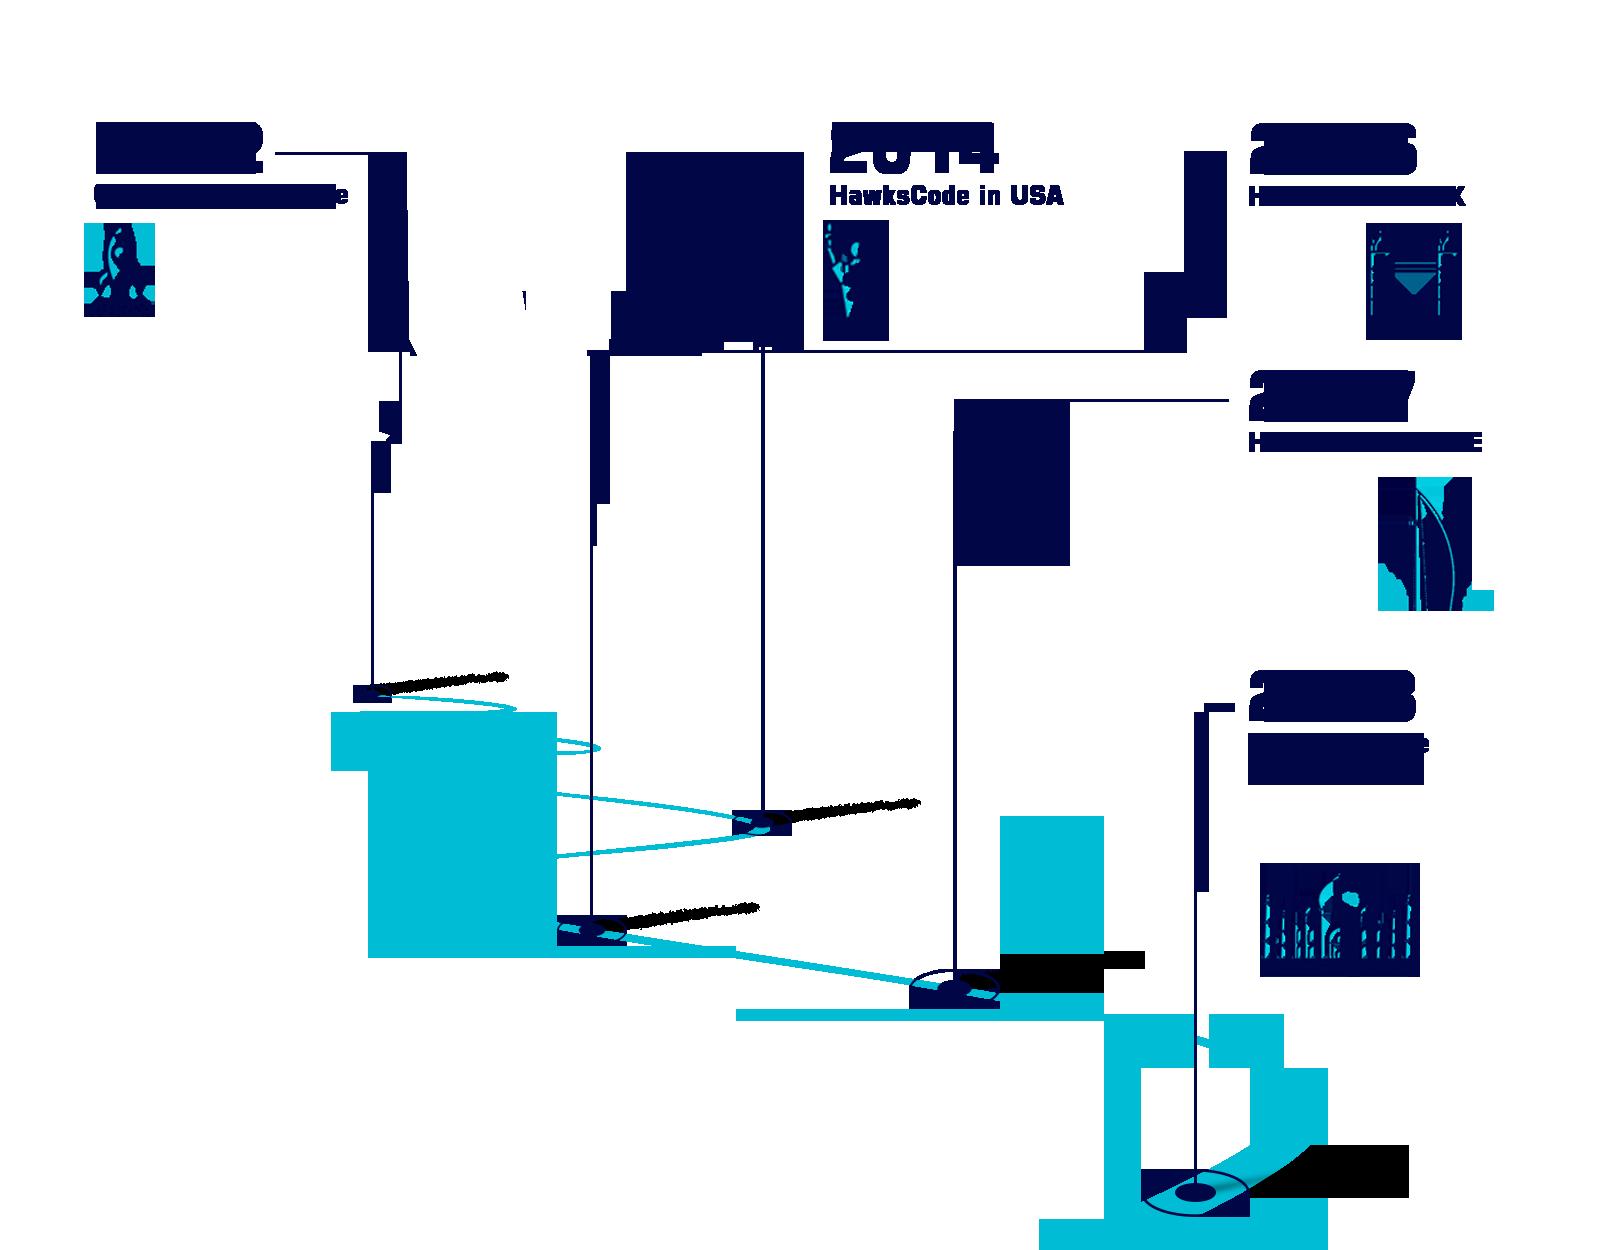 Hawkscode timeline